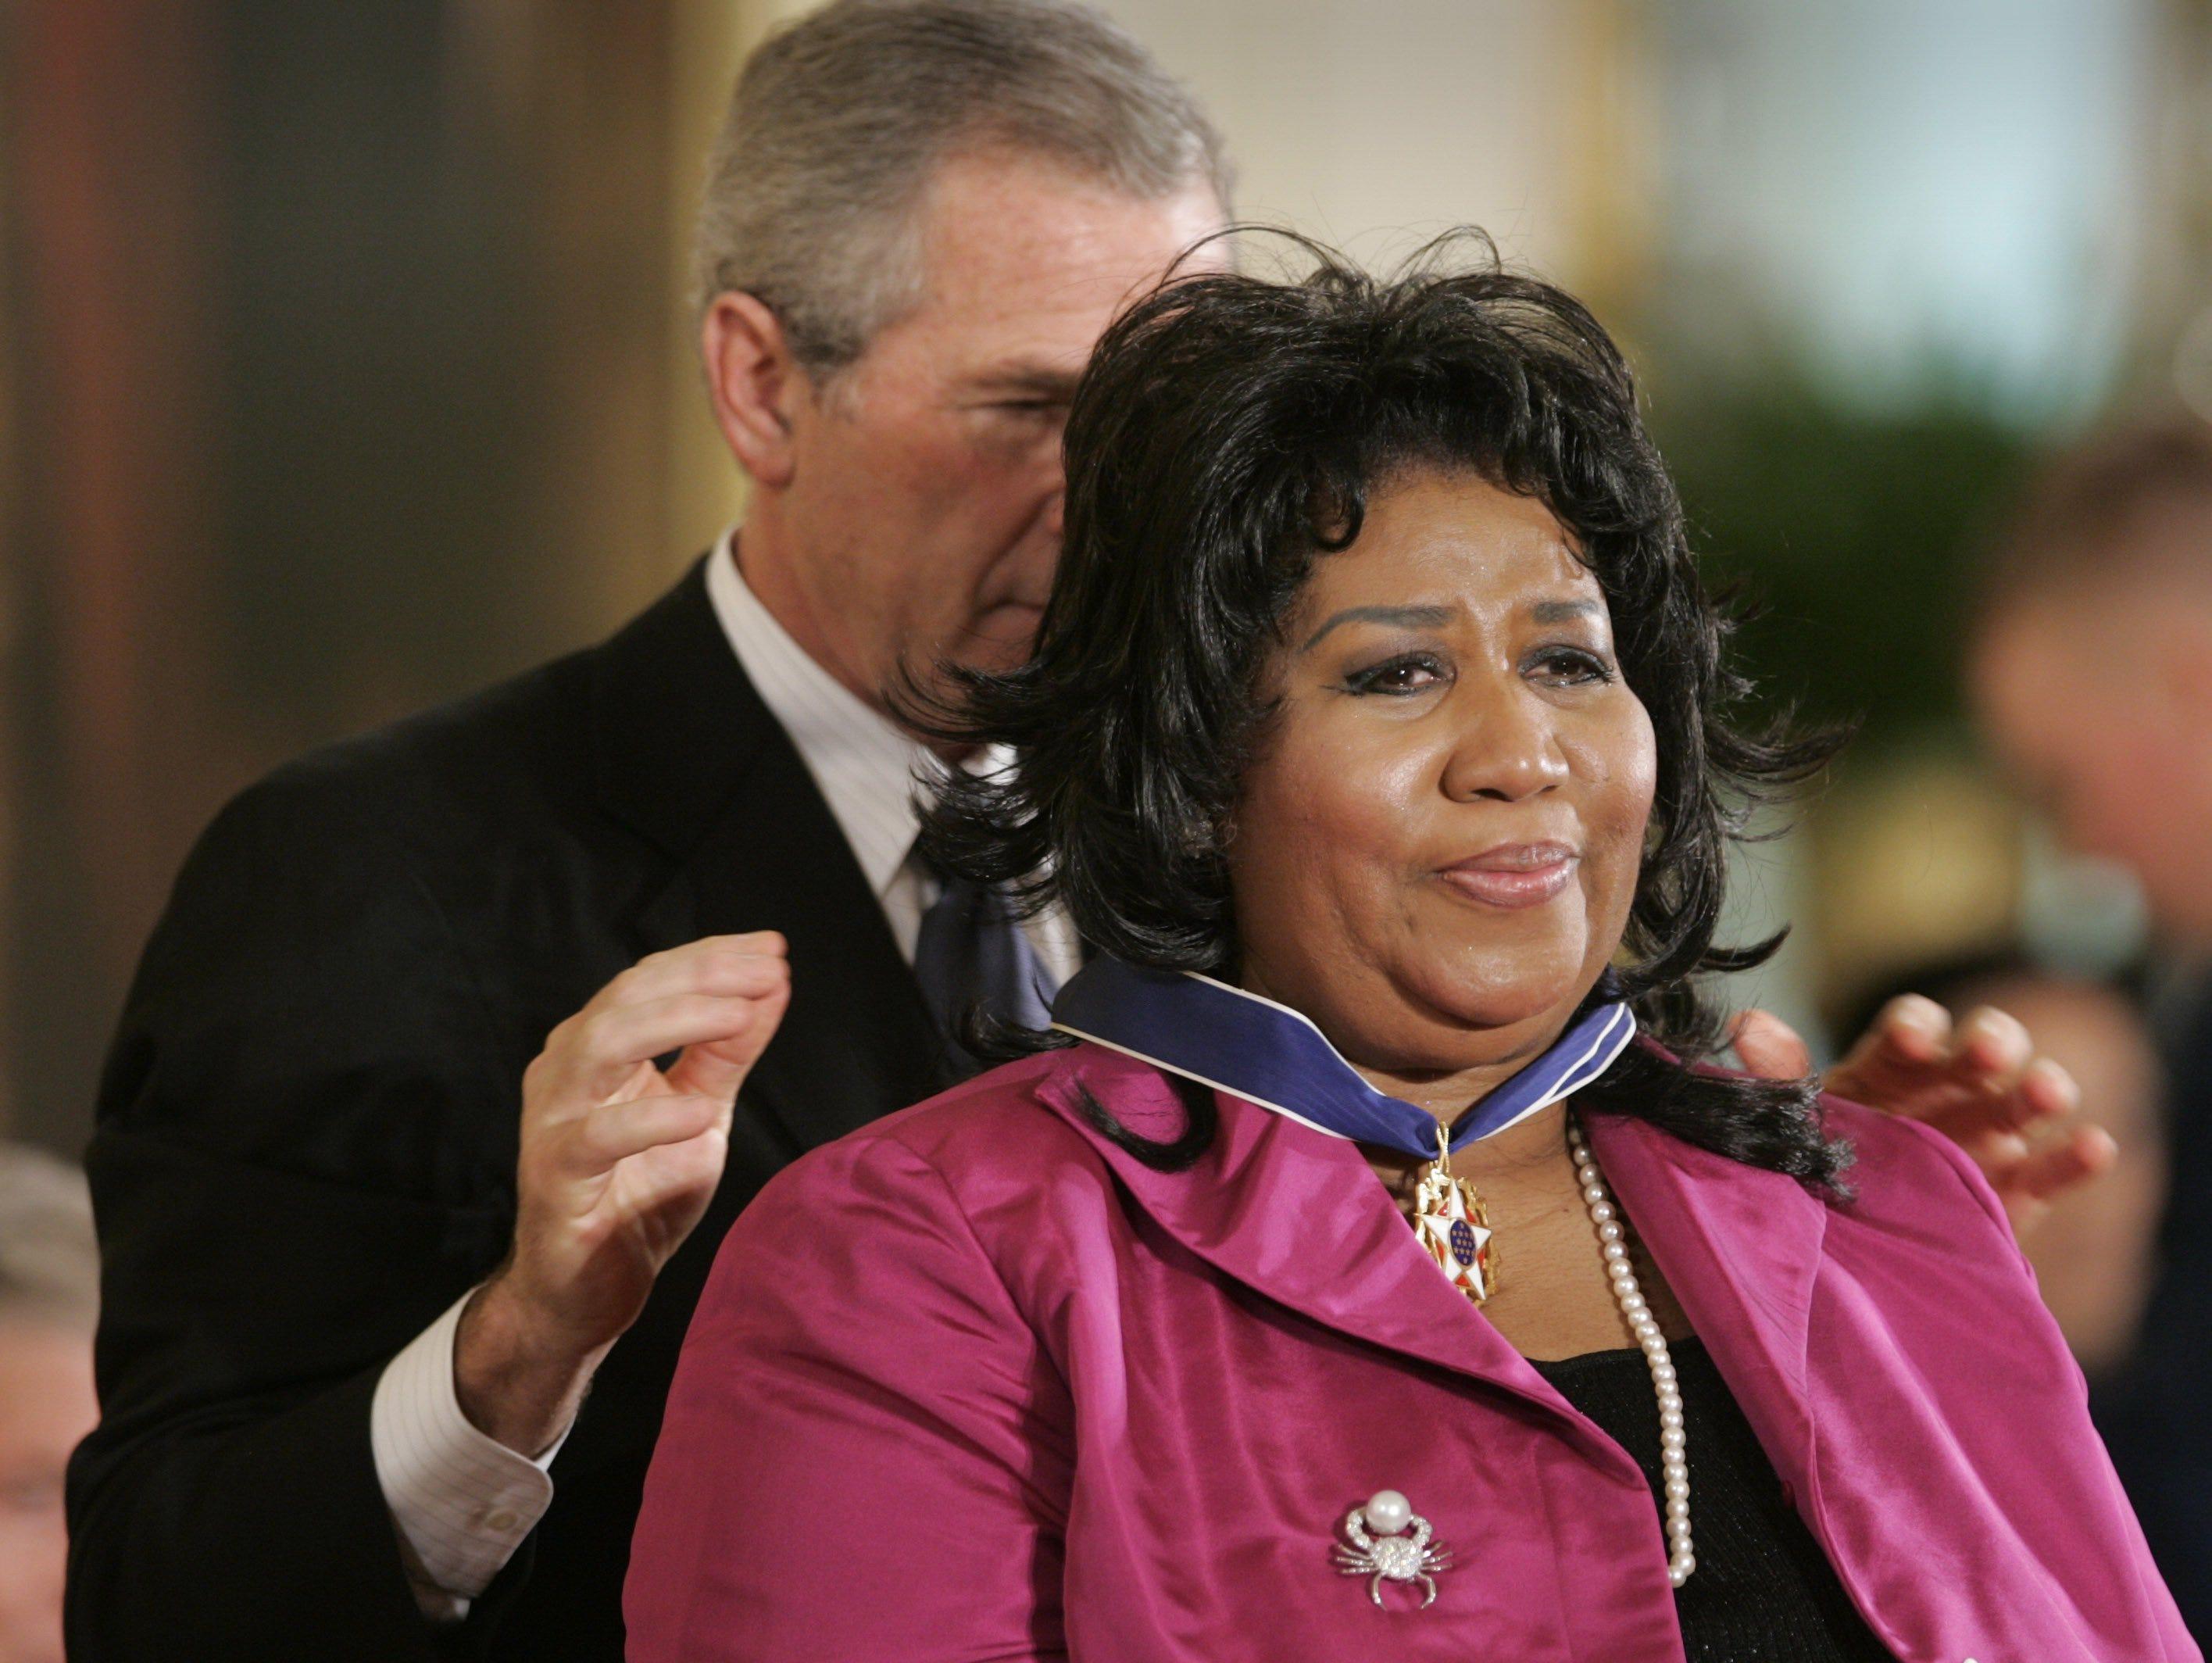 President Bush awards singer Aretha Franklin the Presidential Medal of Freedom Award in the East Room of the White House, Wednesday, Nov. 9, 2005, in Washington. The Presidential Medal of Freedom is the highest civilian award given.